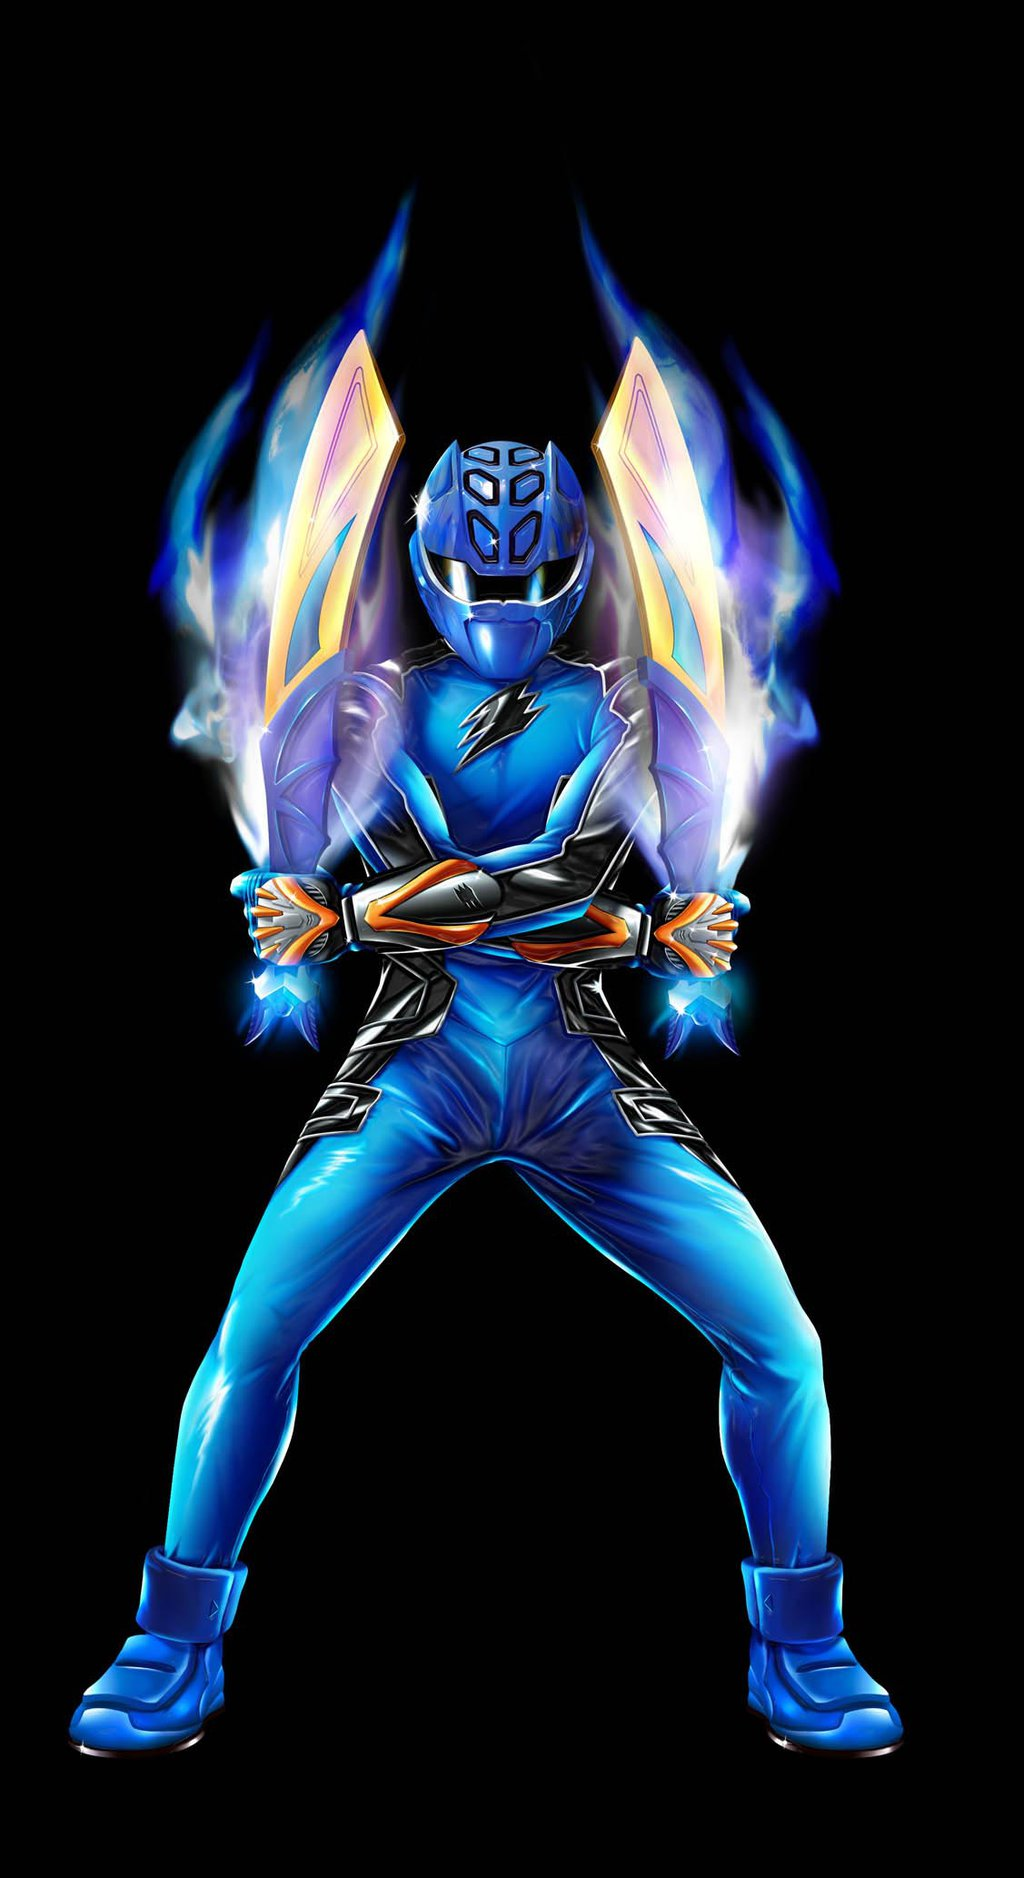 1024x1878px Power Rangers Jungle Fury Wallpaper 1024x1878